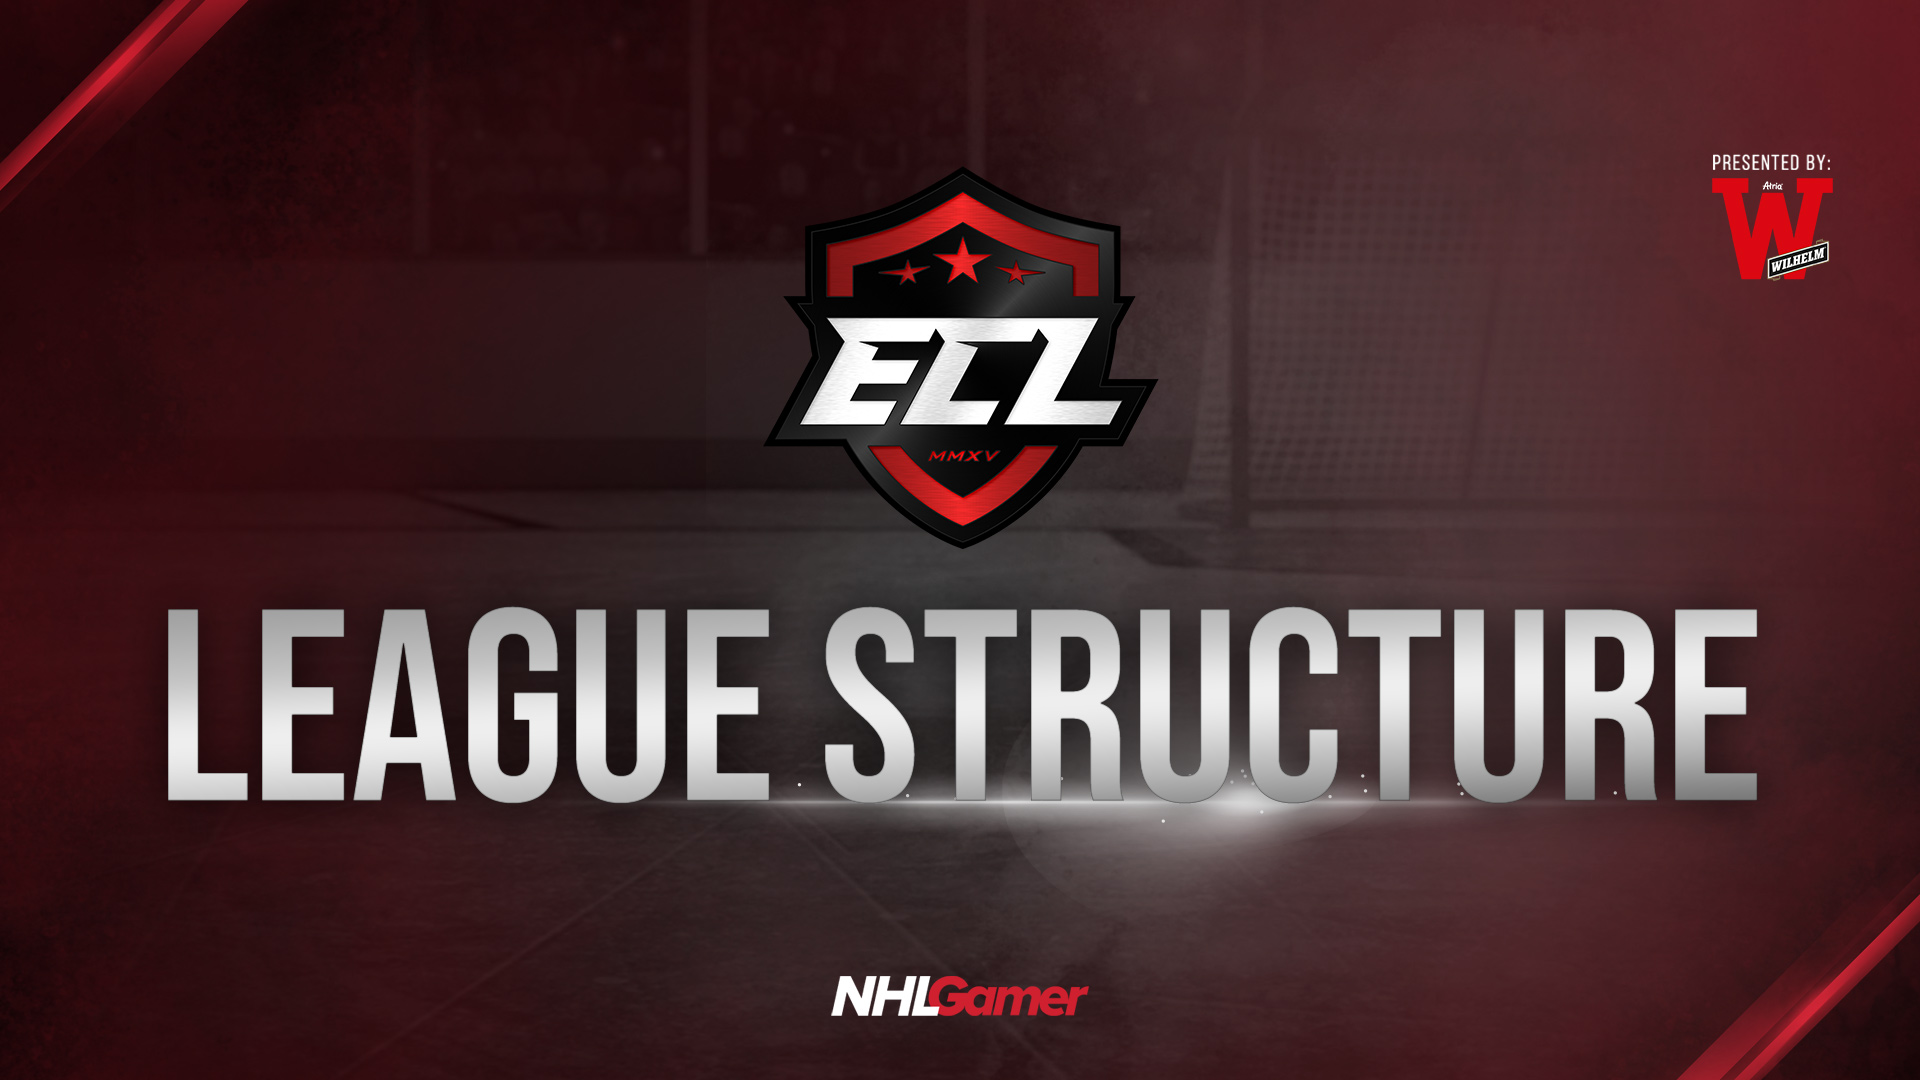 ECL_League_Structure.jpg